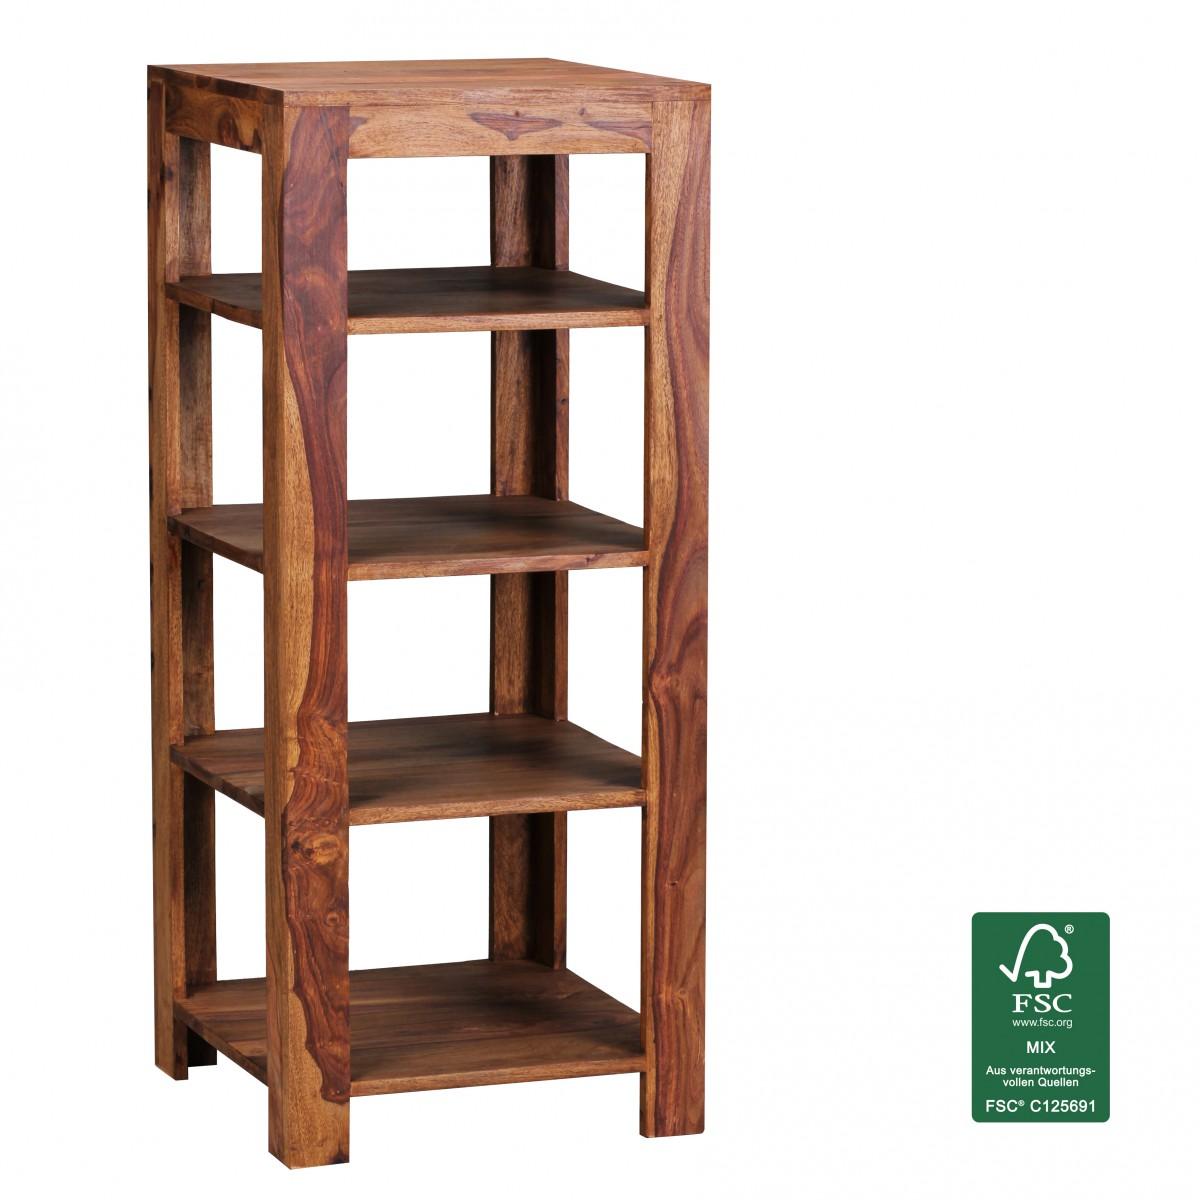 Wohnling sheesham massif bois tag re 105 cm rayon casier meubles neuf ebay - Etagere casier bois ...